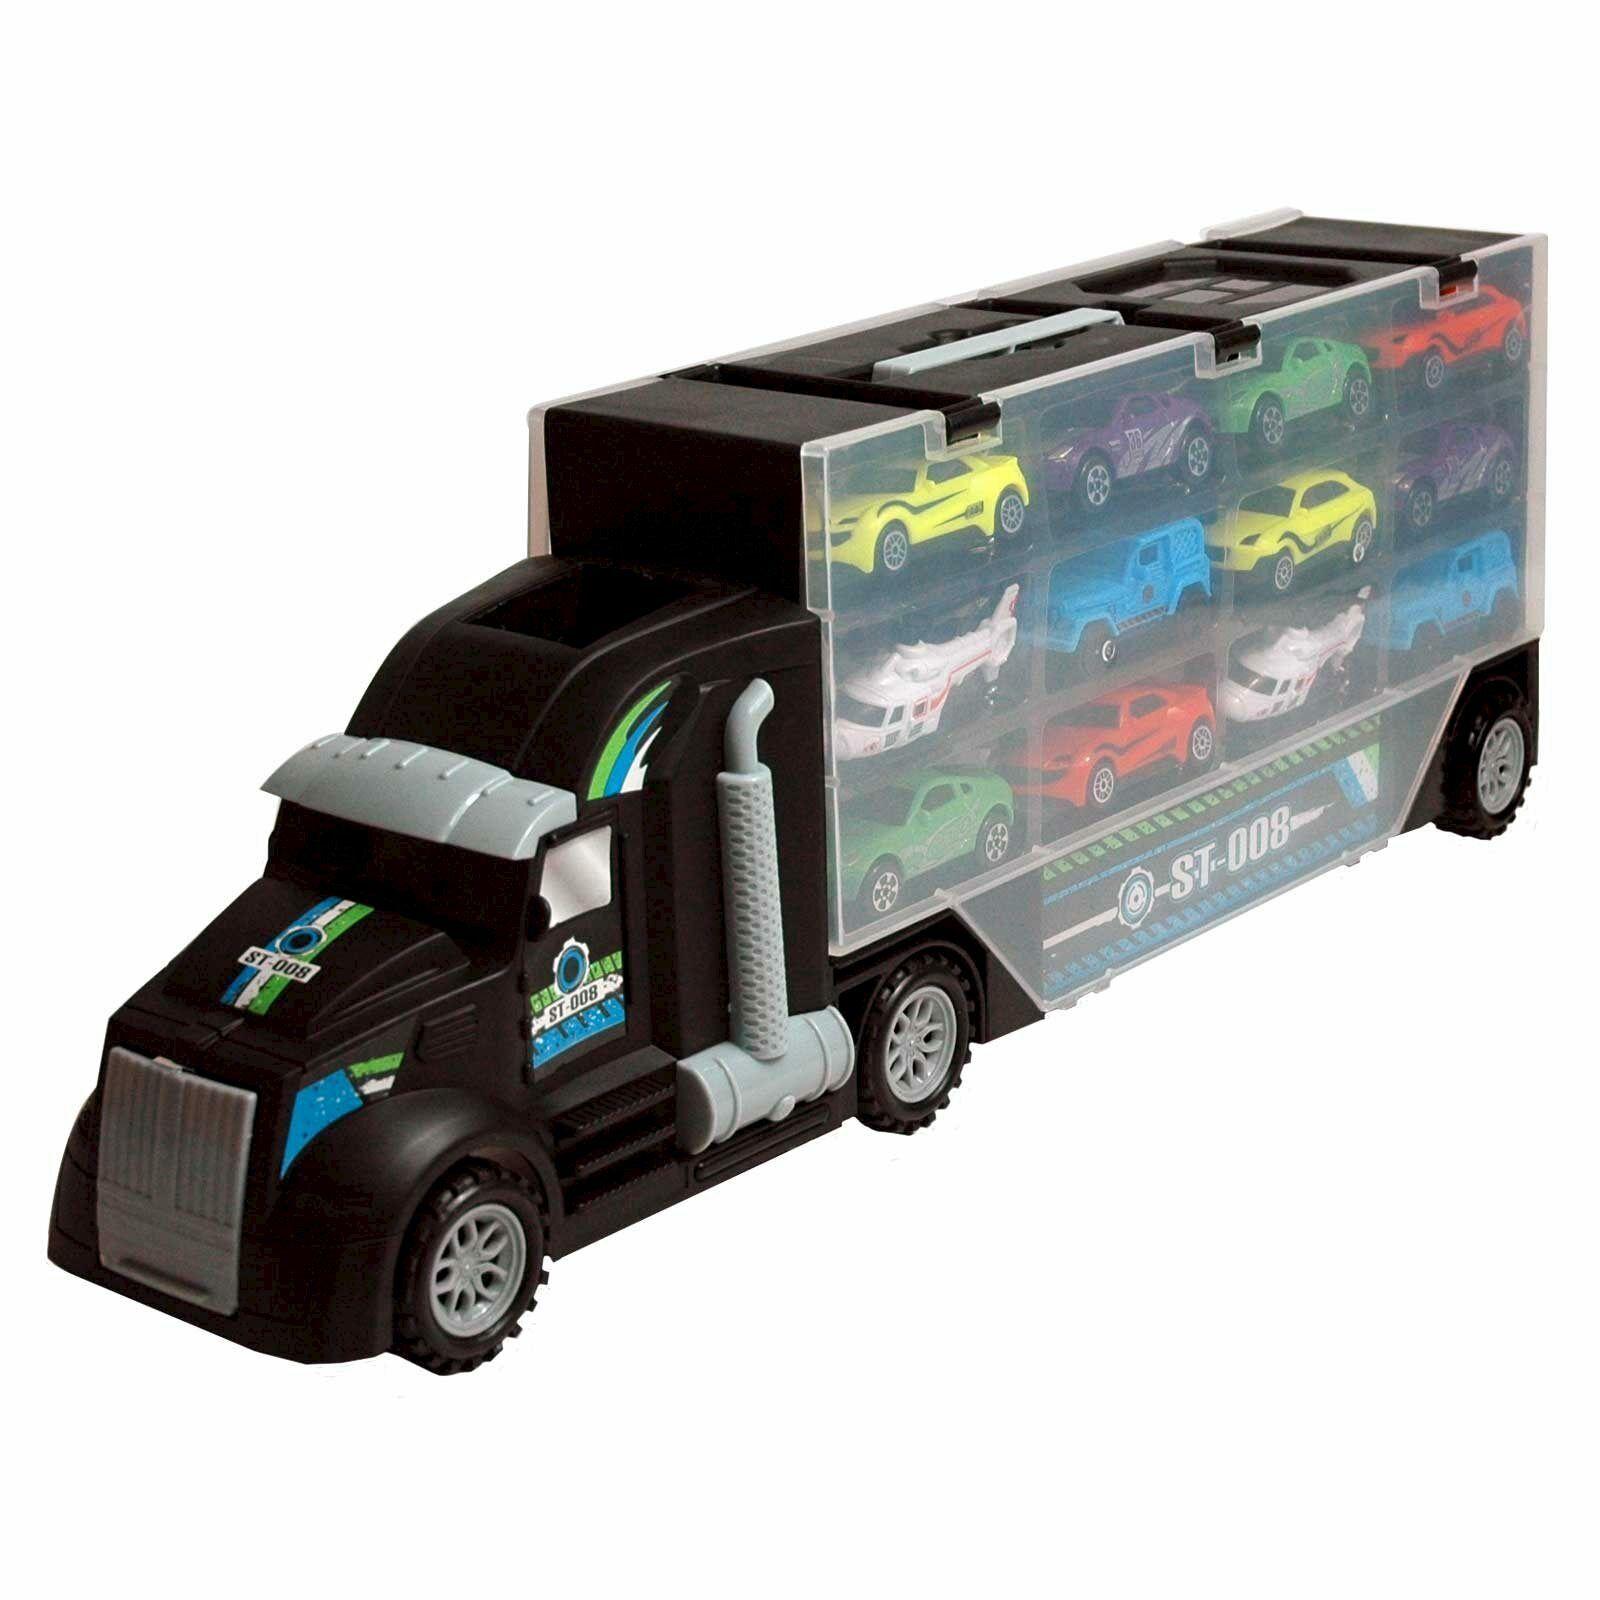 Camión con Coches de Juguete,Juguete Camión,P858-a